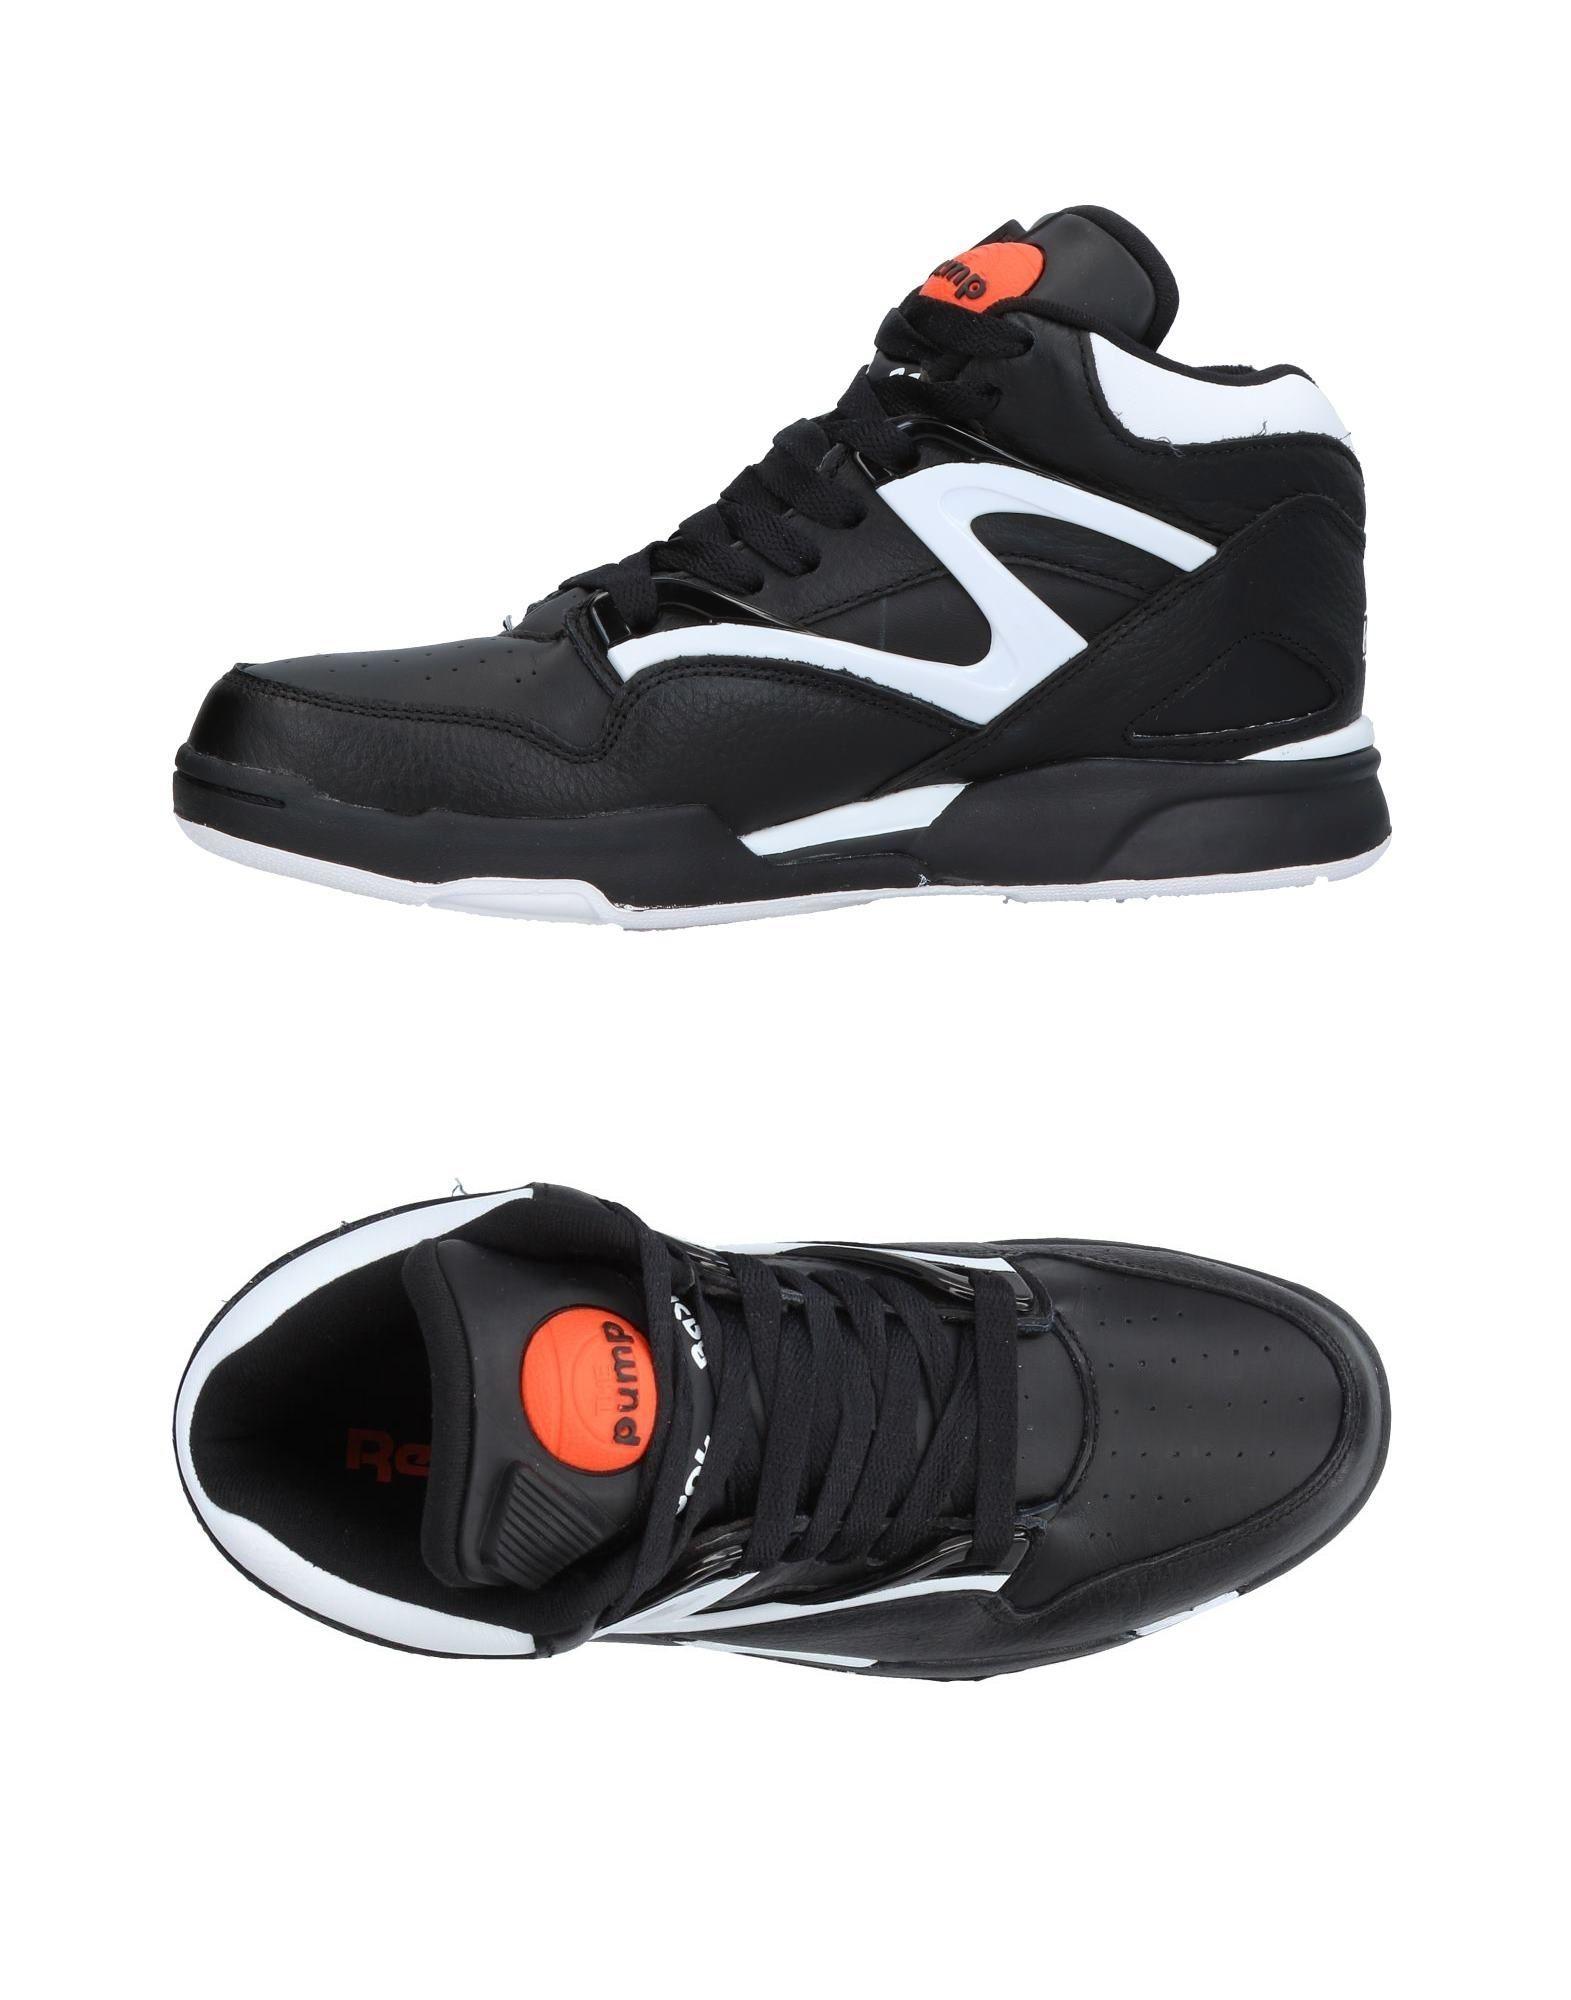 REEBOK Высокие кеды и кроссовки кеды кроссовки высокие dc council mid tx stone camo